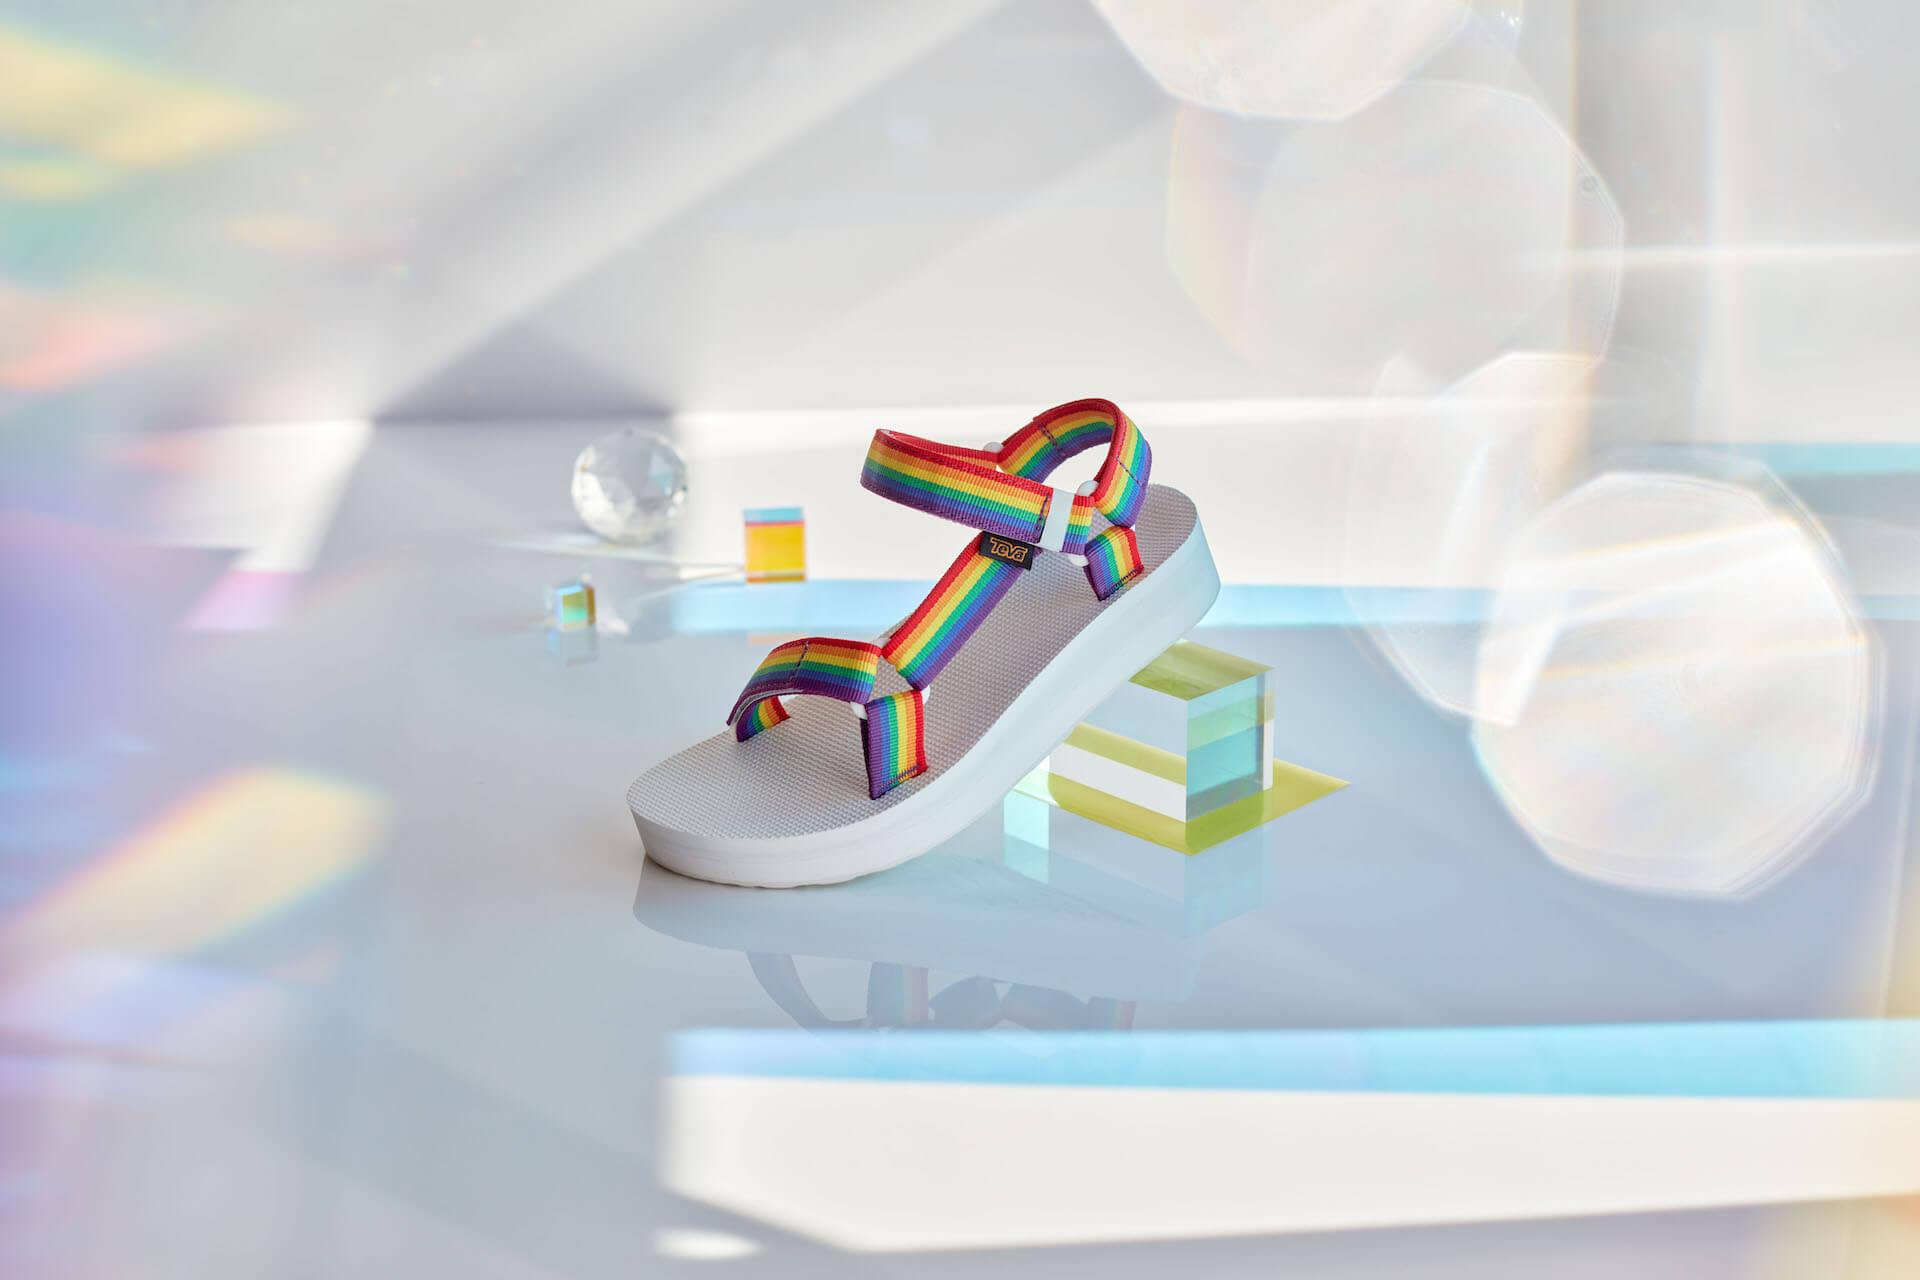 Tevaから、LGBTQ+支援団体「It Gets Better Project」記念サンダル登場!レインボーカラーの2種類 lf200421_teva_universal_06